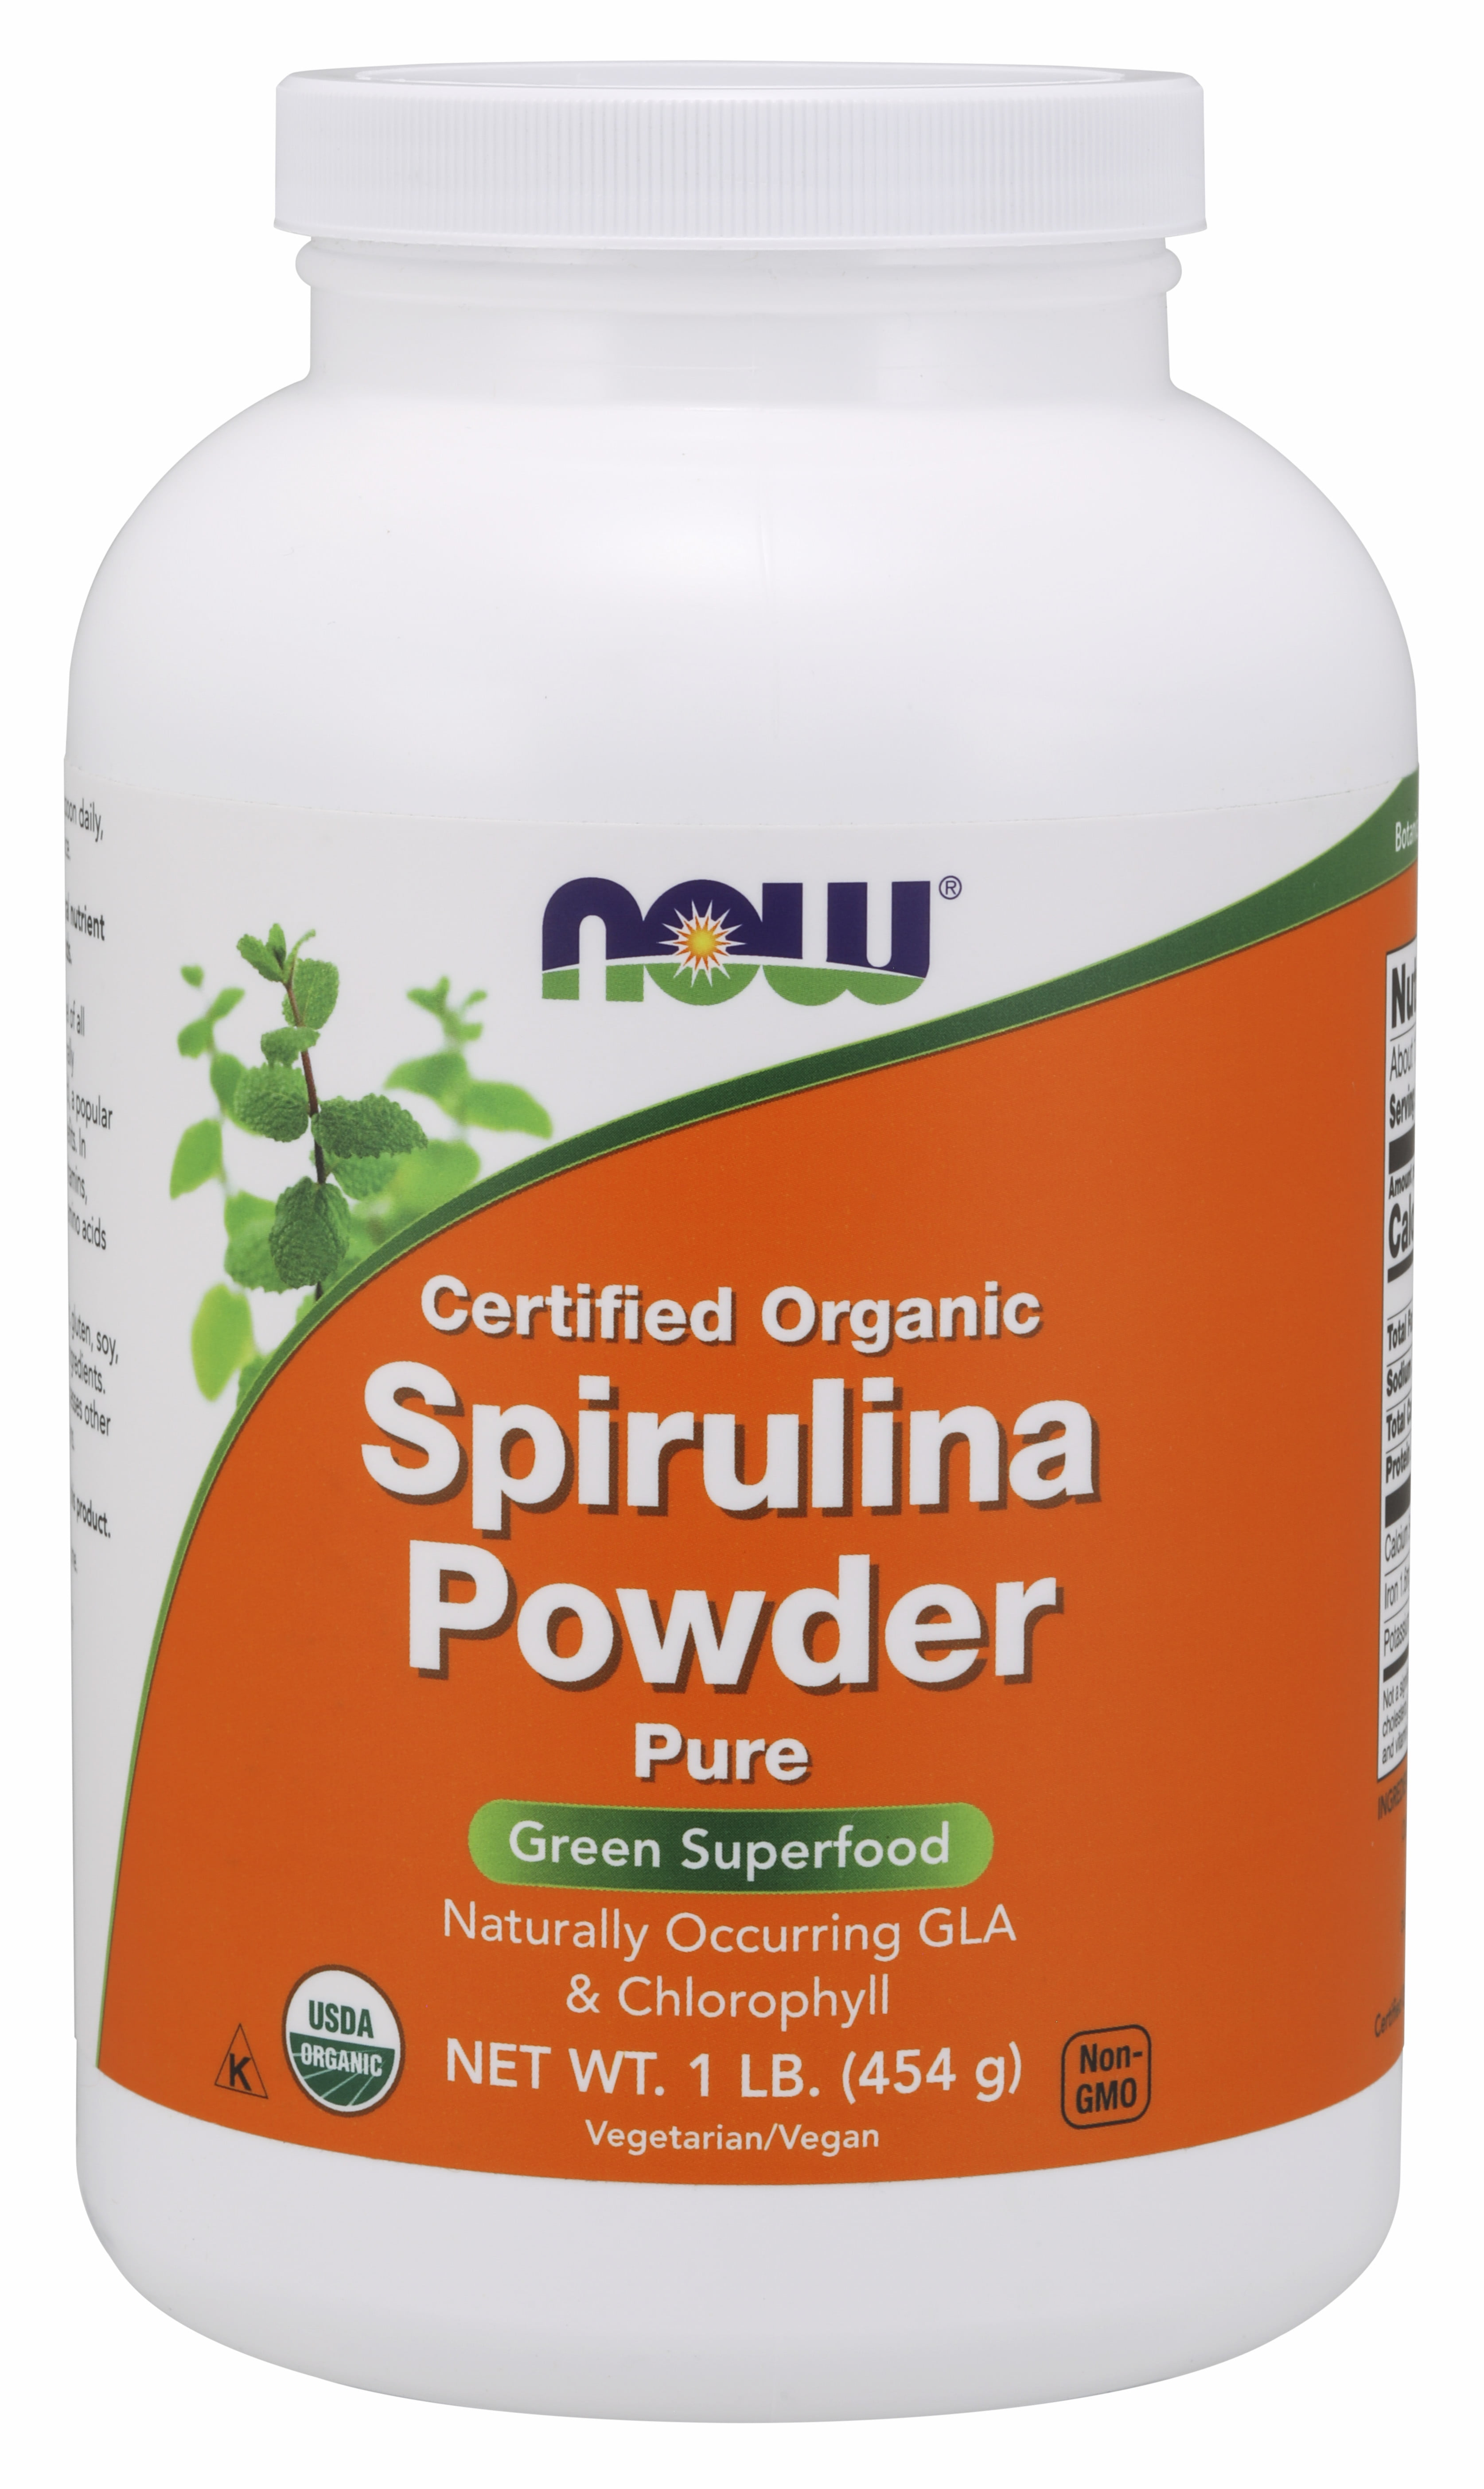 Organic Spirulina Powder Organic Certified High in Protein and B Vitamins